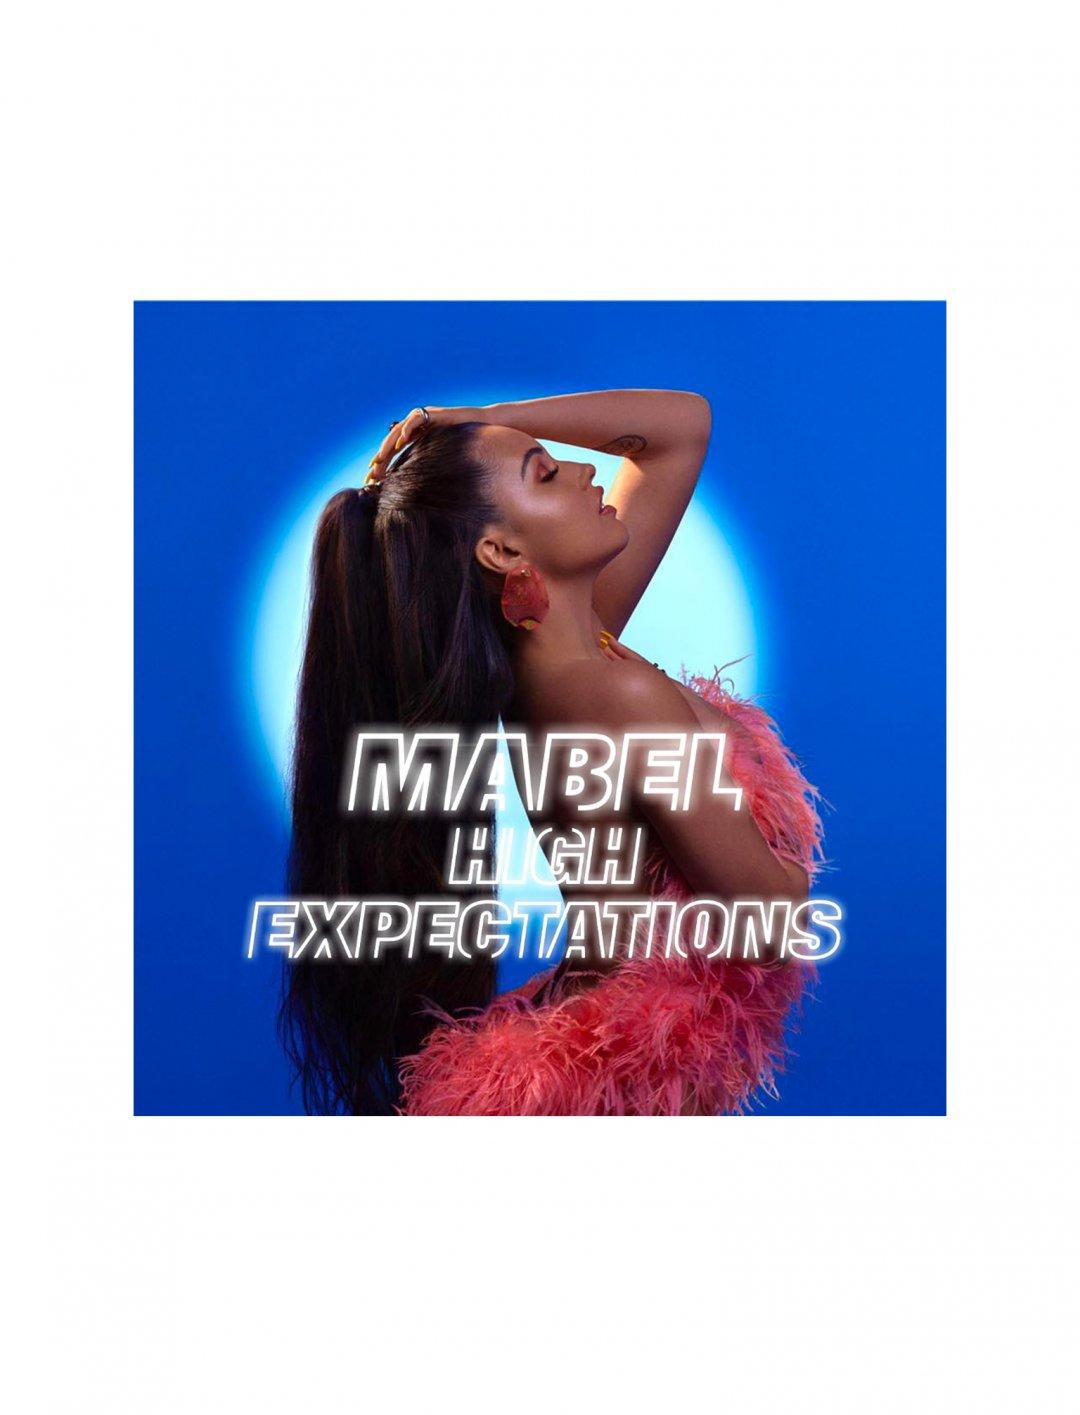 High Expectations Album Music & Ringtone Mabel